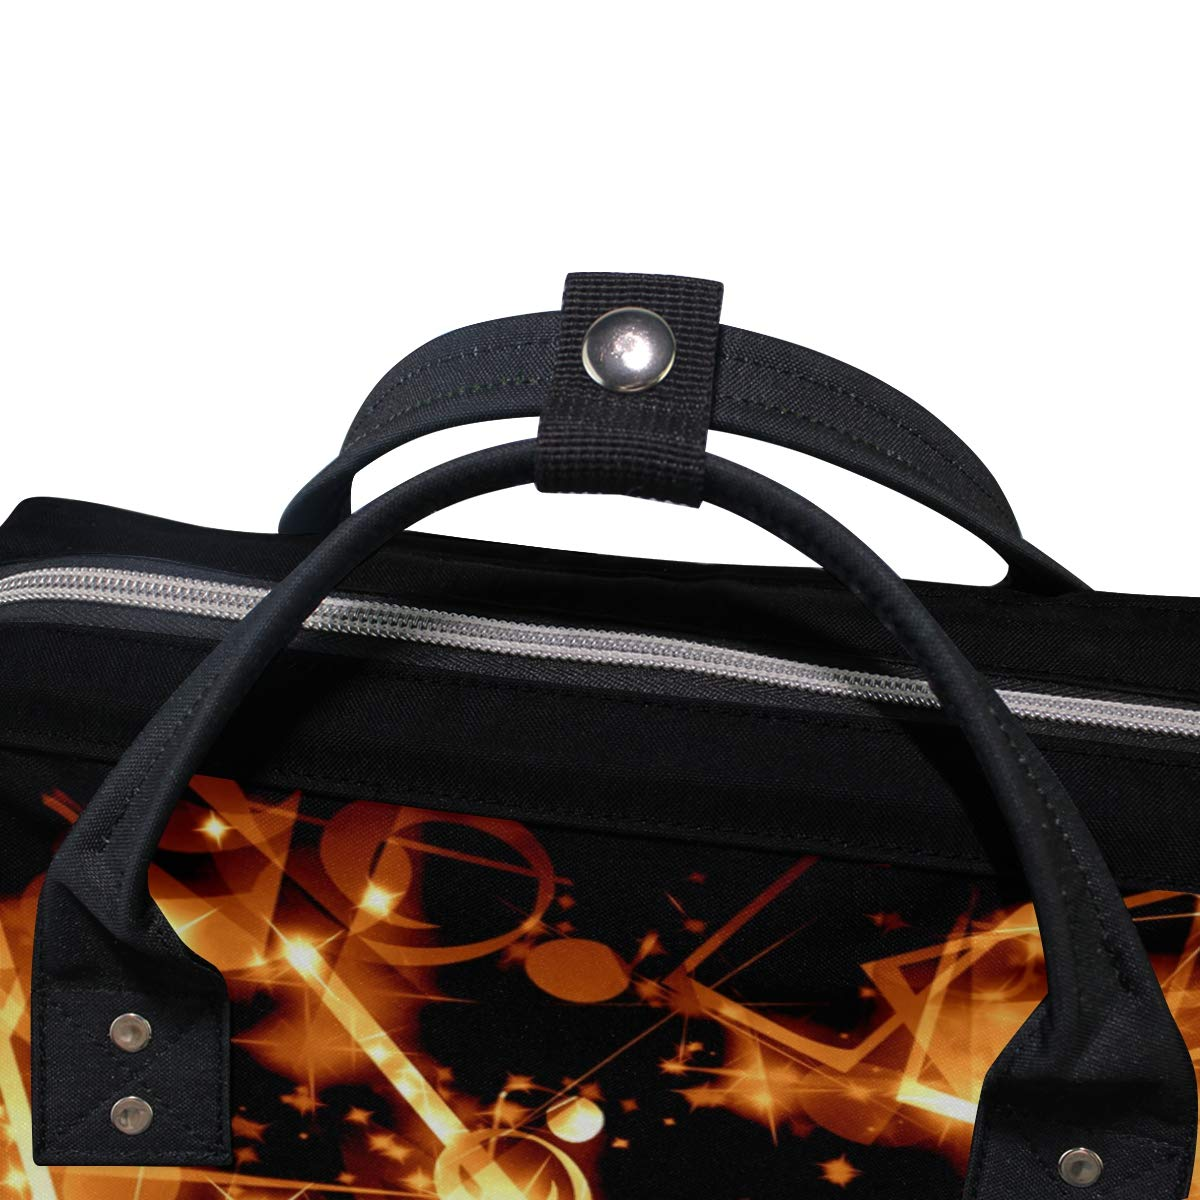 imobaby Glaring Music Notes Changing Bags Large Capacity Handbags Canvas Shoulder Bag Backpack